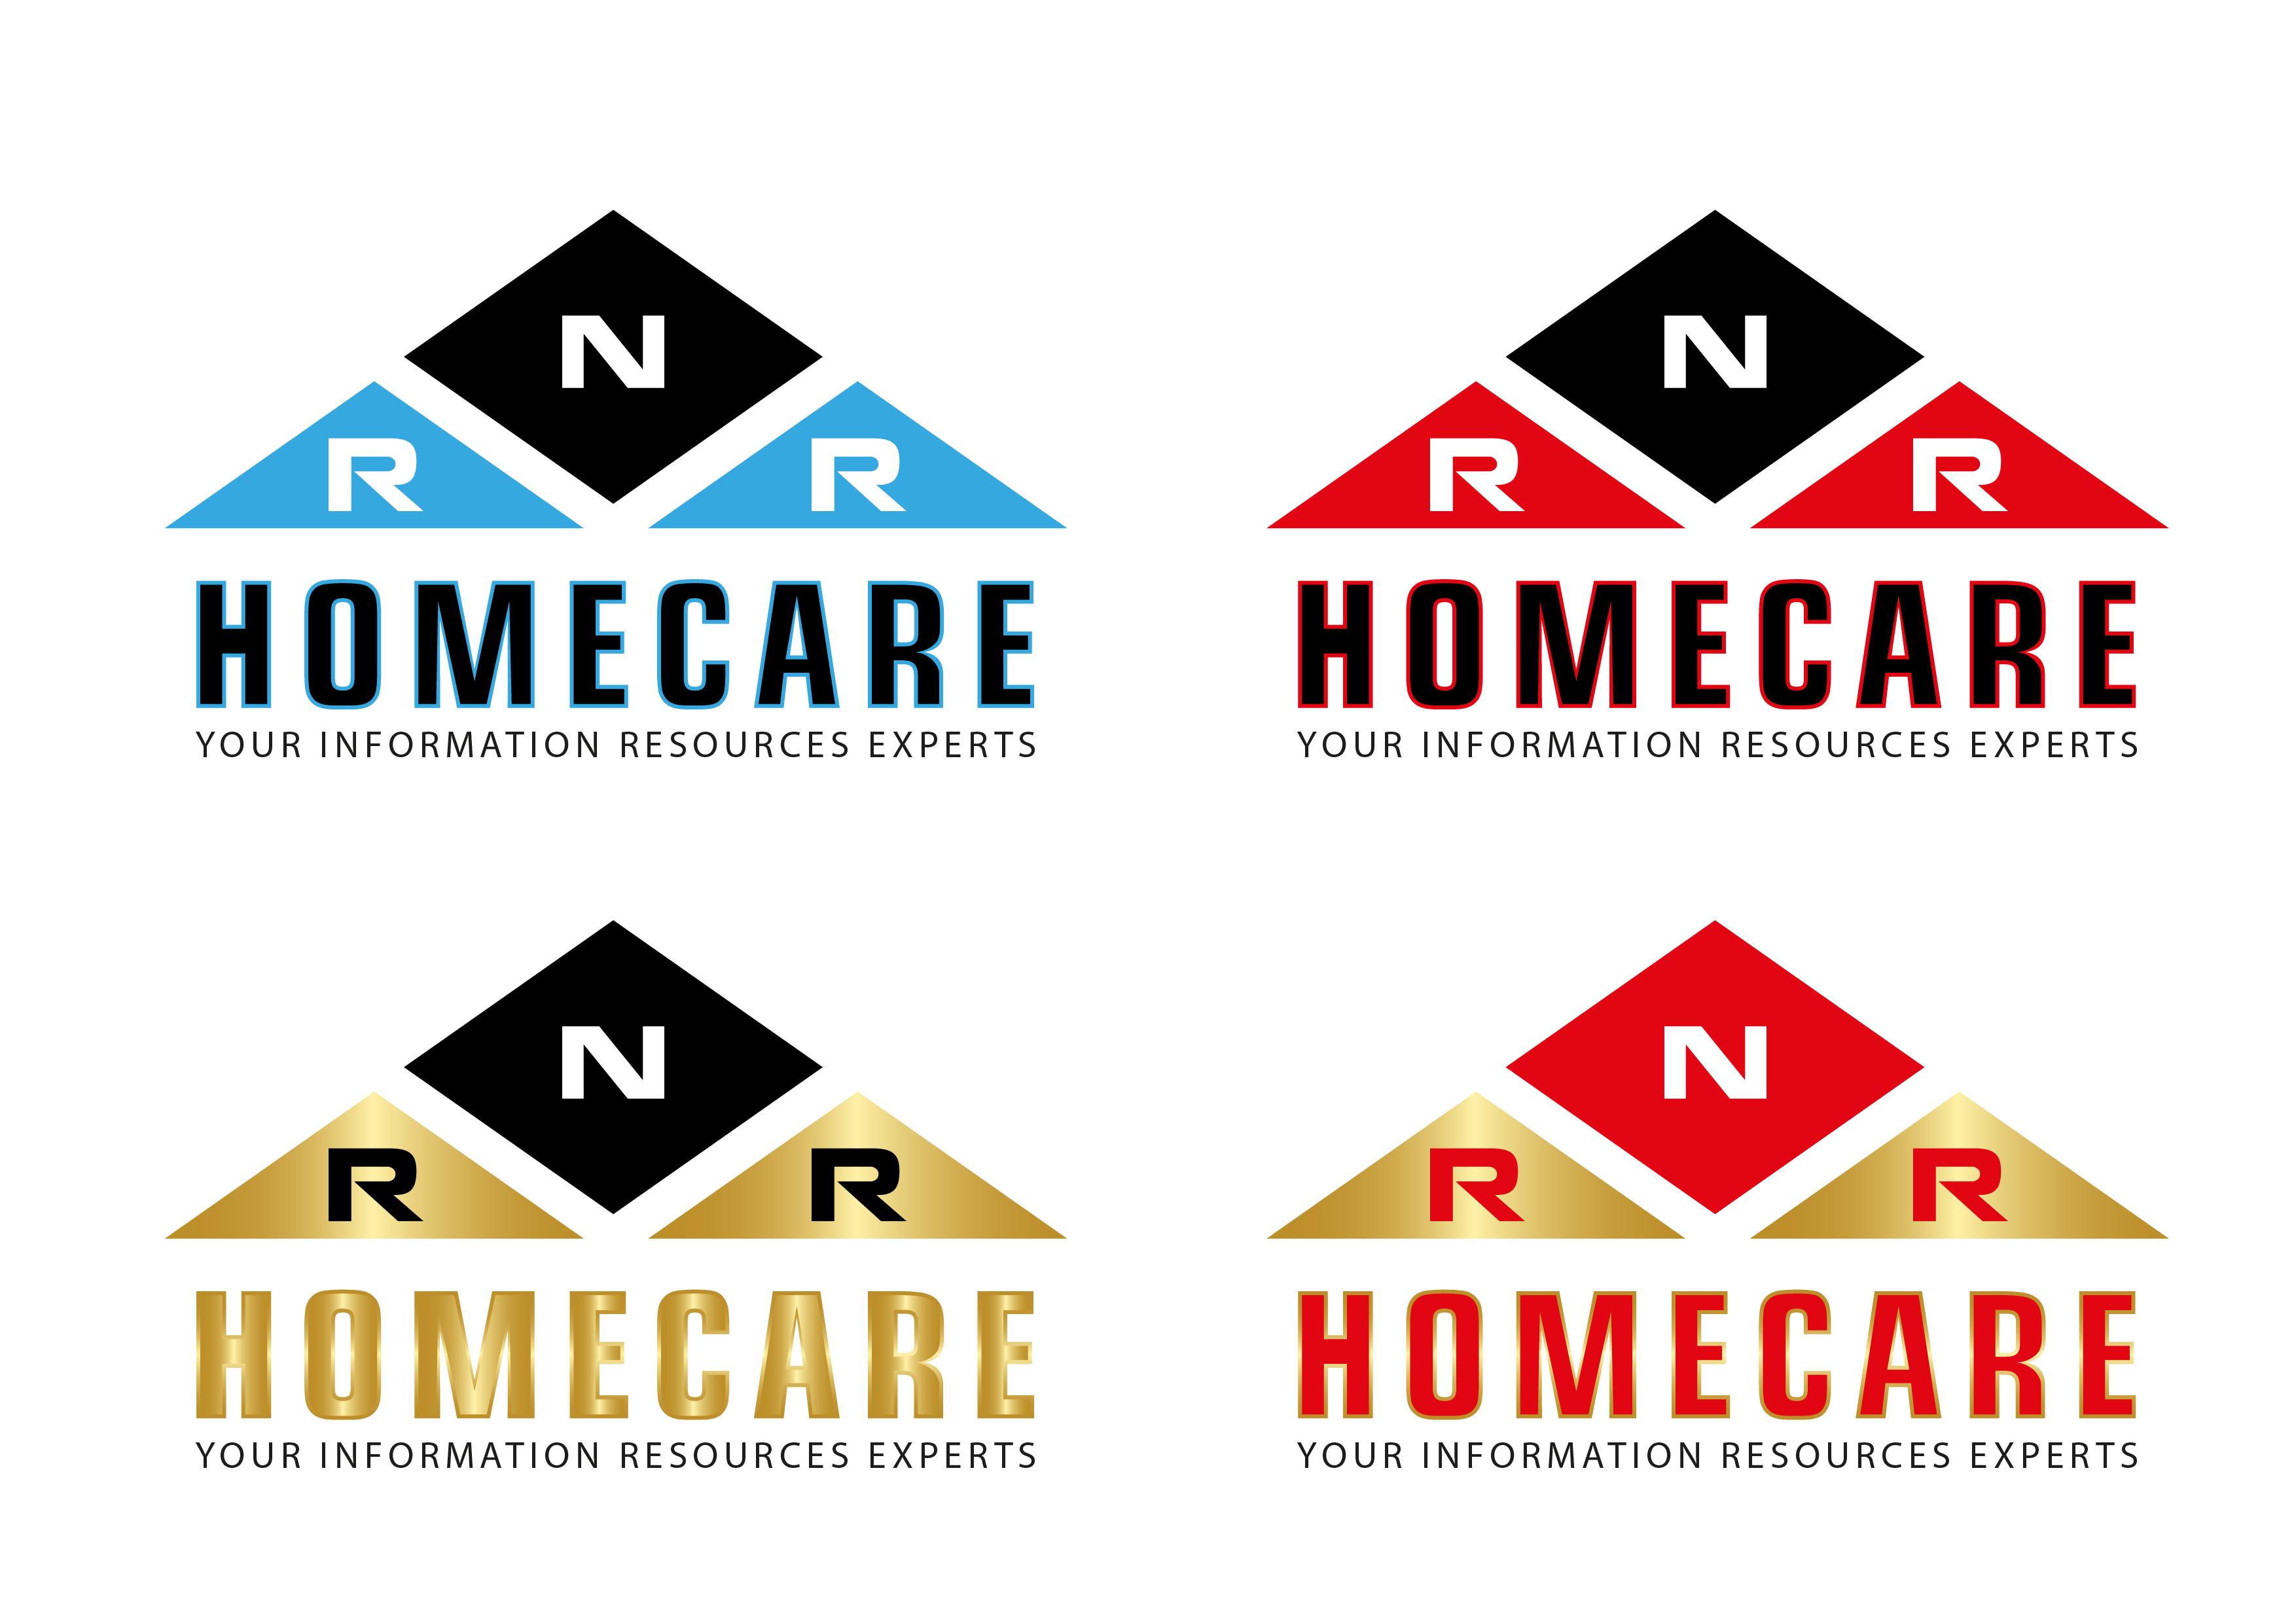 Logo Design by 3draw - Entry No. 35 in the Logo Design Contest Imaginative Logo Design for RNR HomeCare.